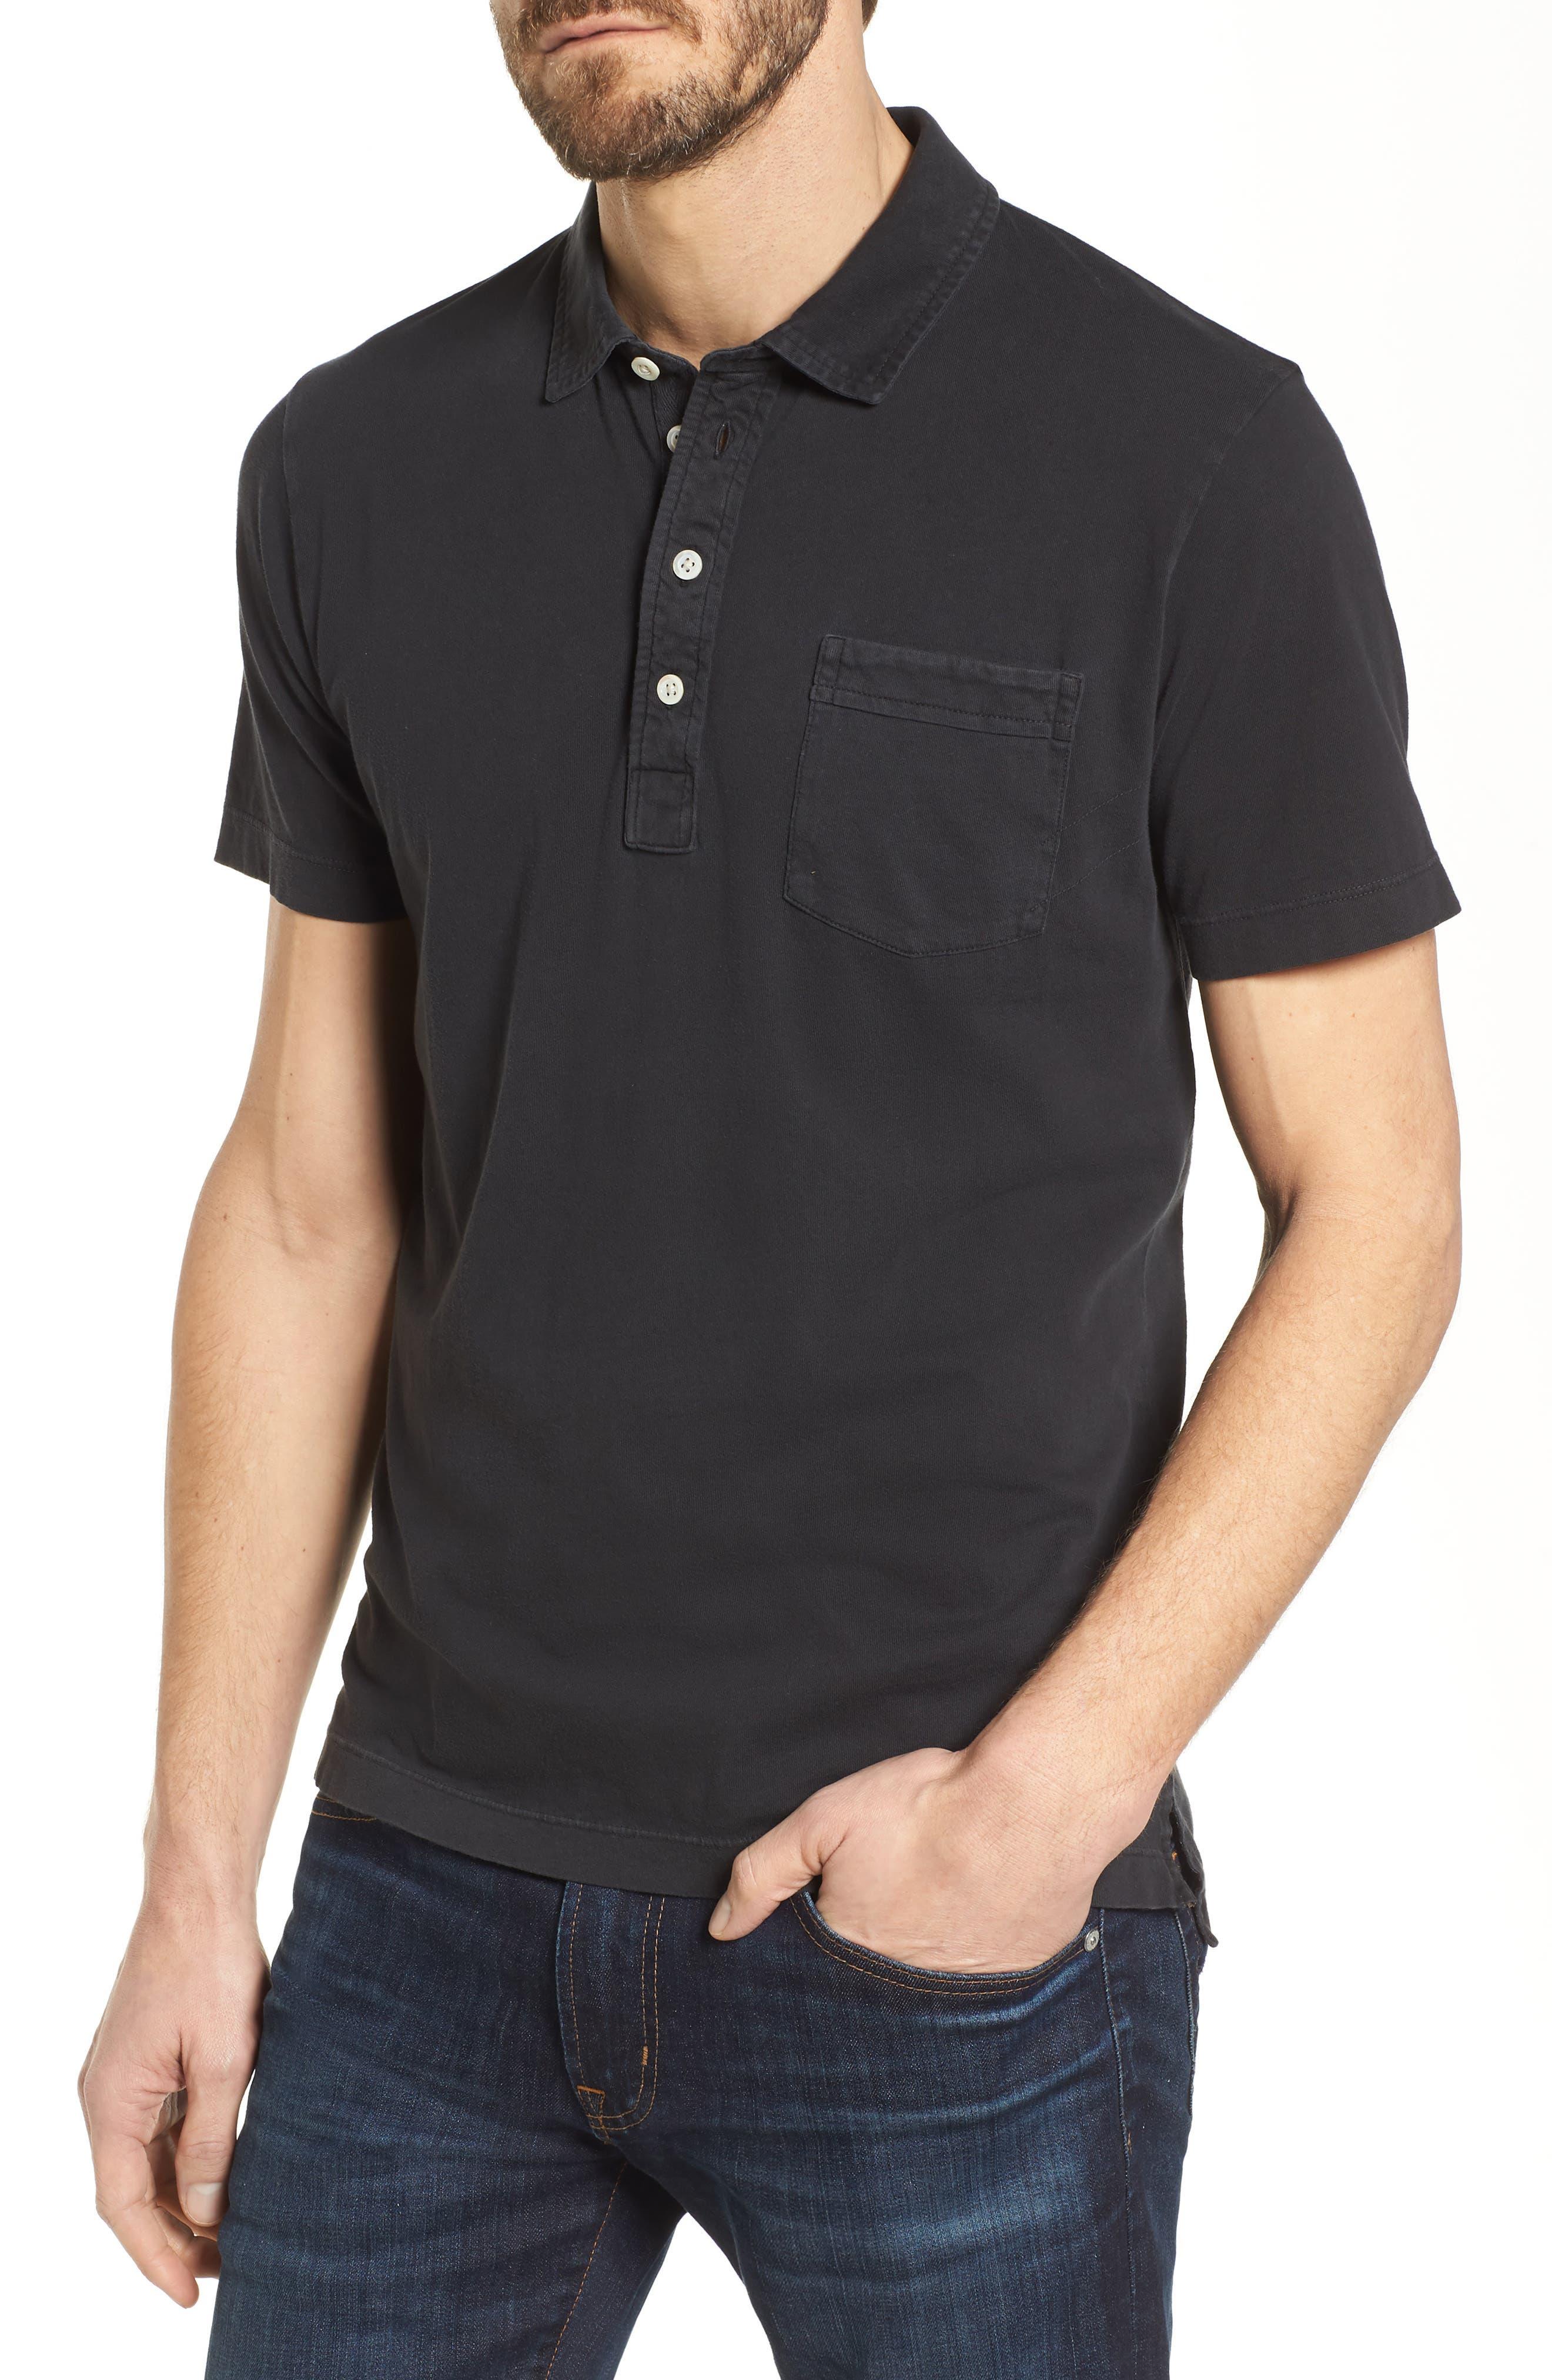 BILLY REID, Pensacola Slim Fit Garment Dye Polo, Main thumbnail 1, color, BLACK